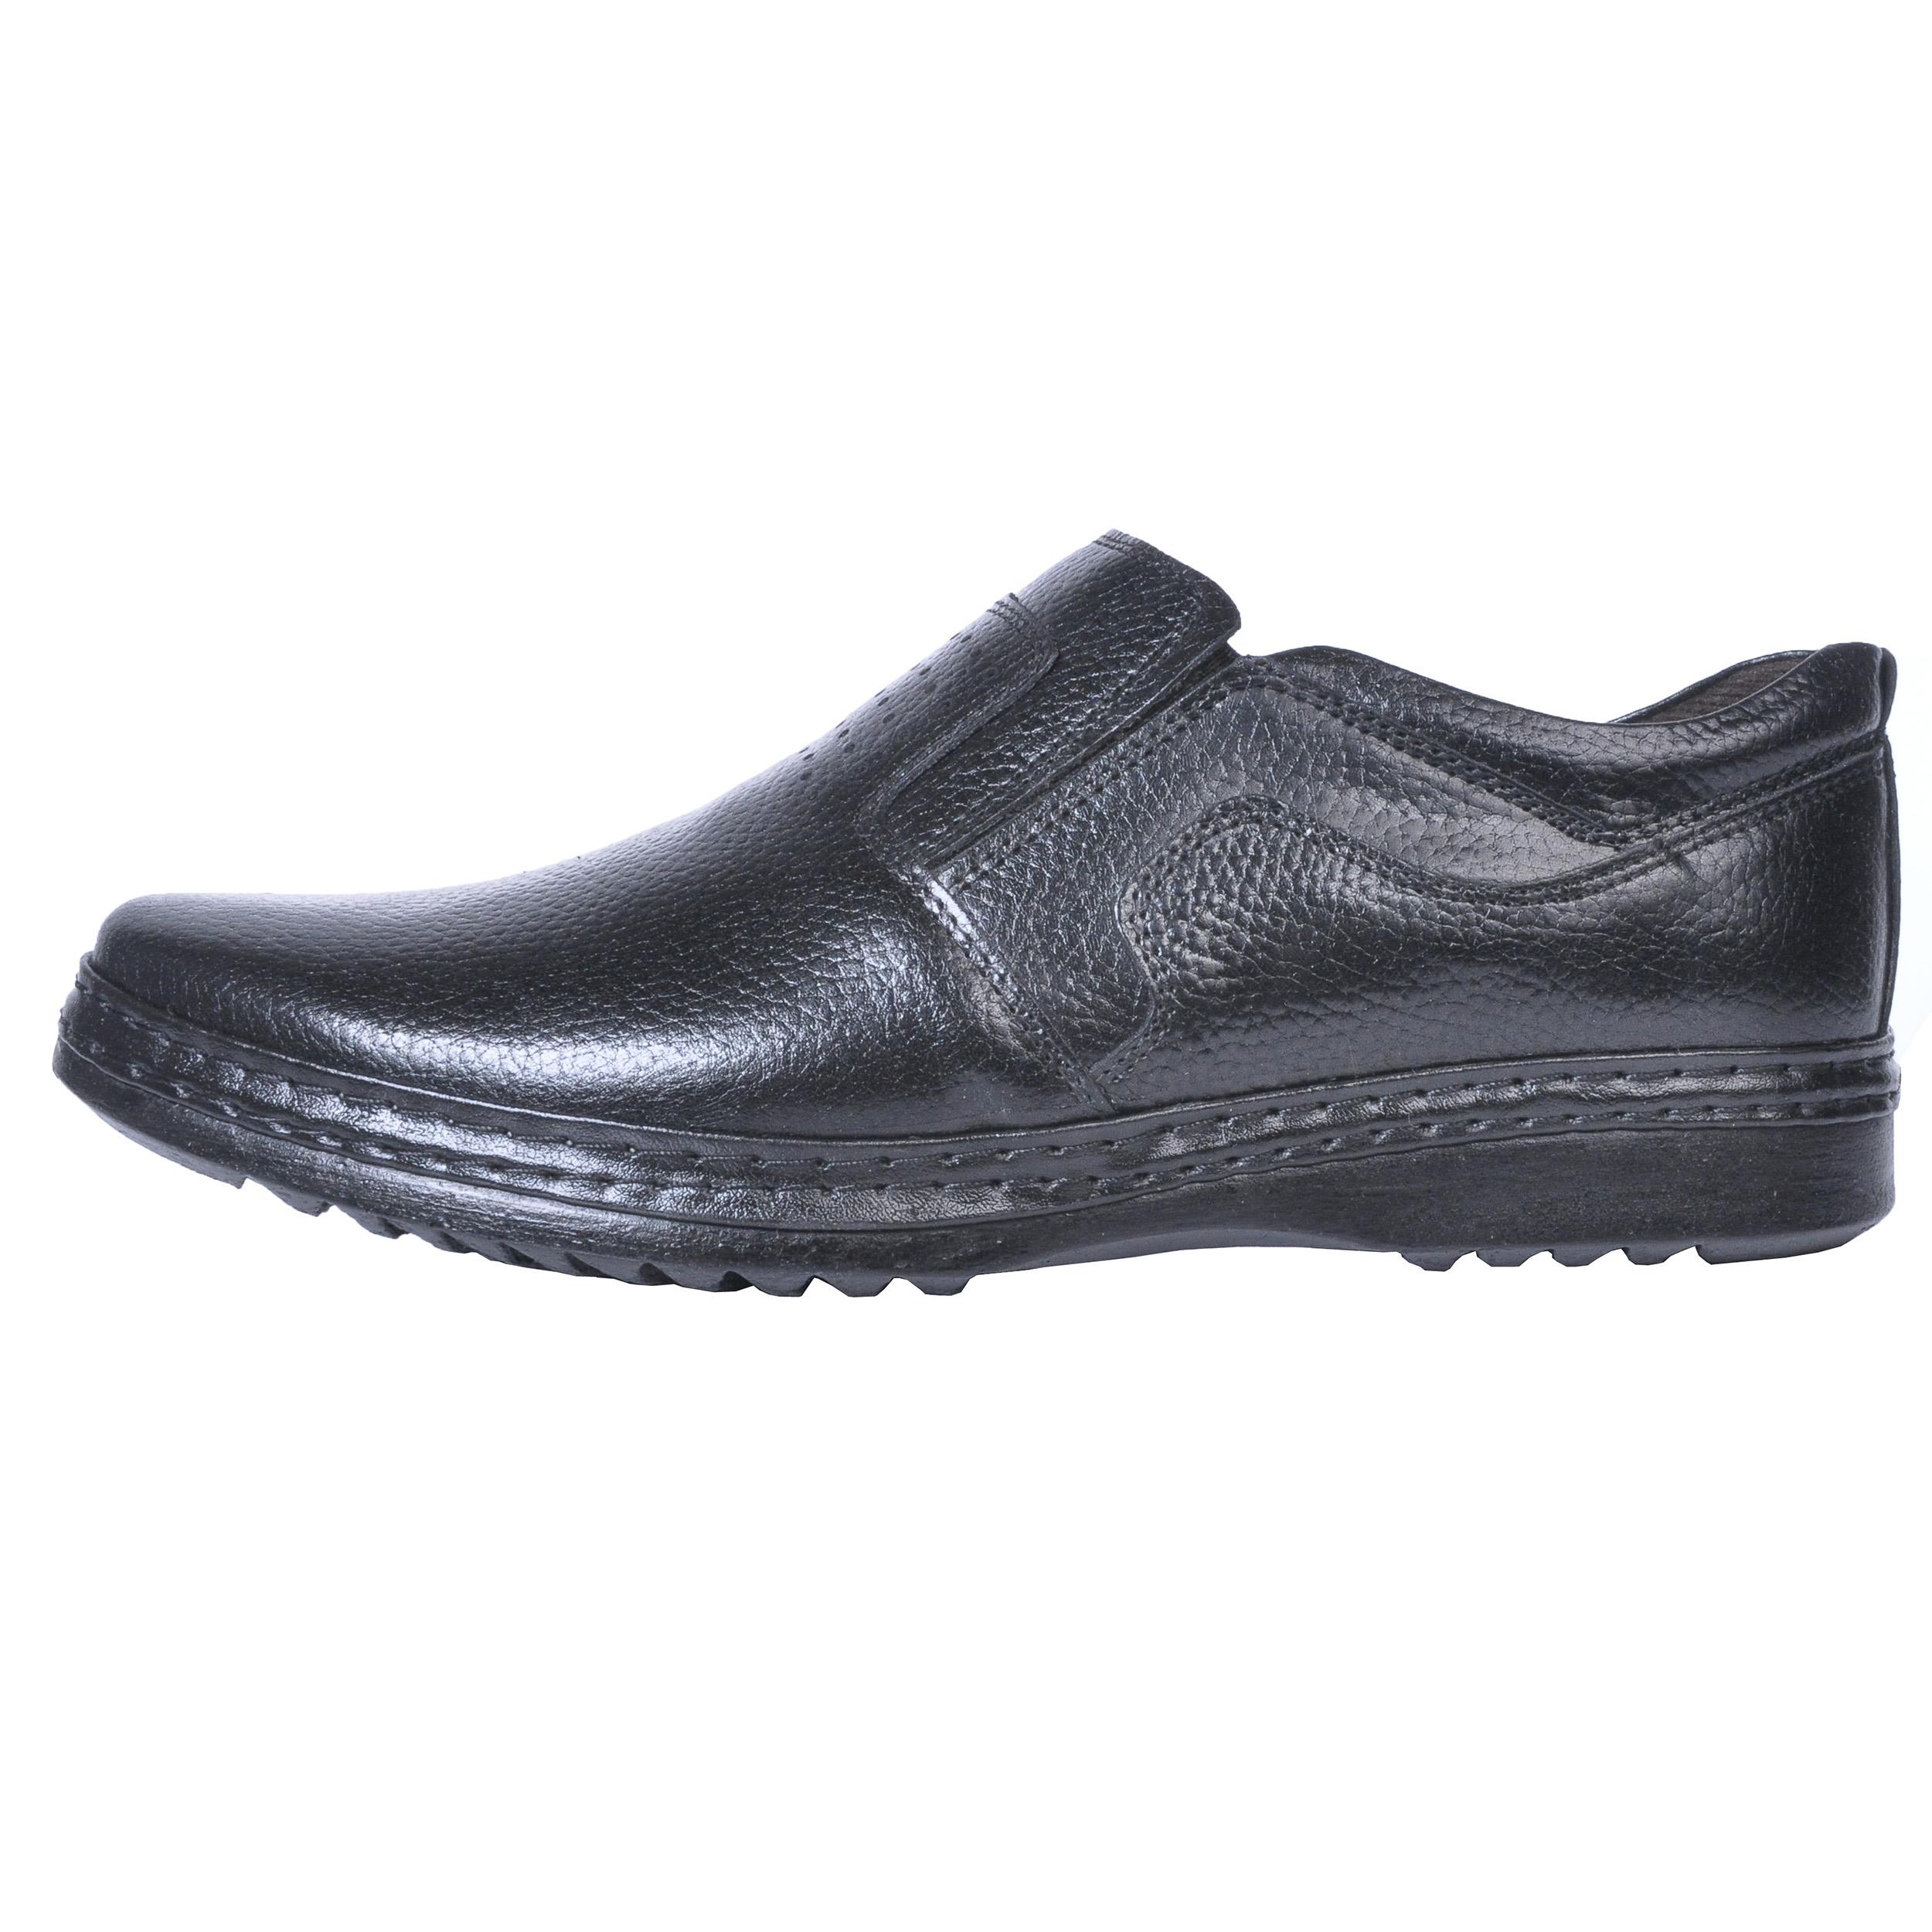 کفش روزمره مردانه مدل m2018s